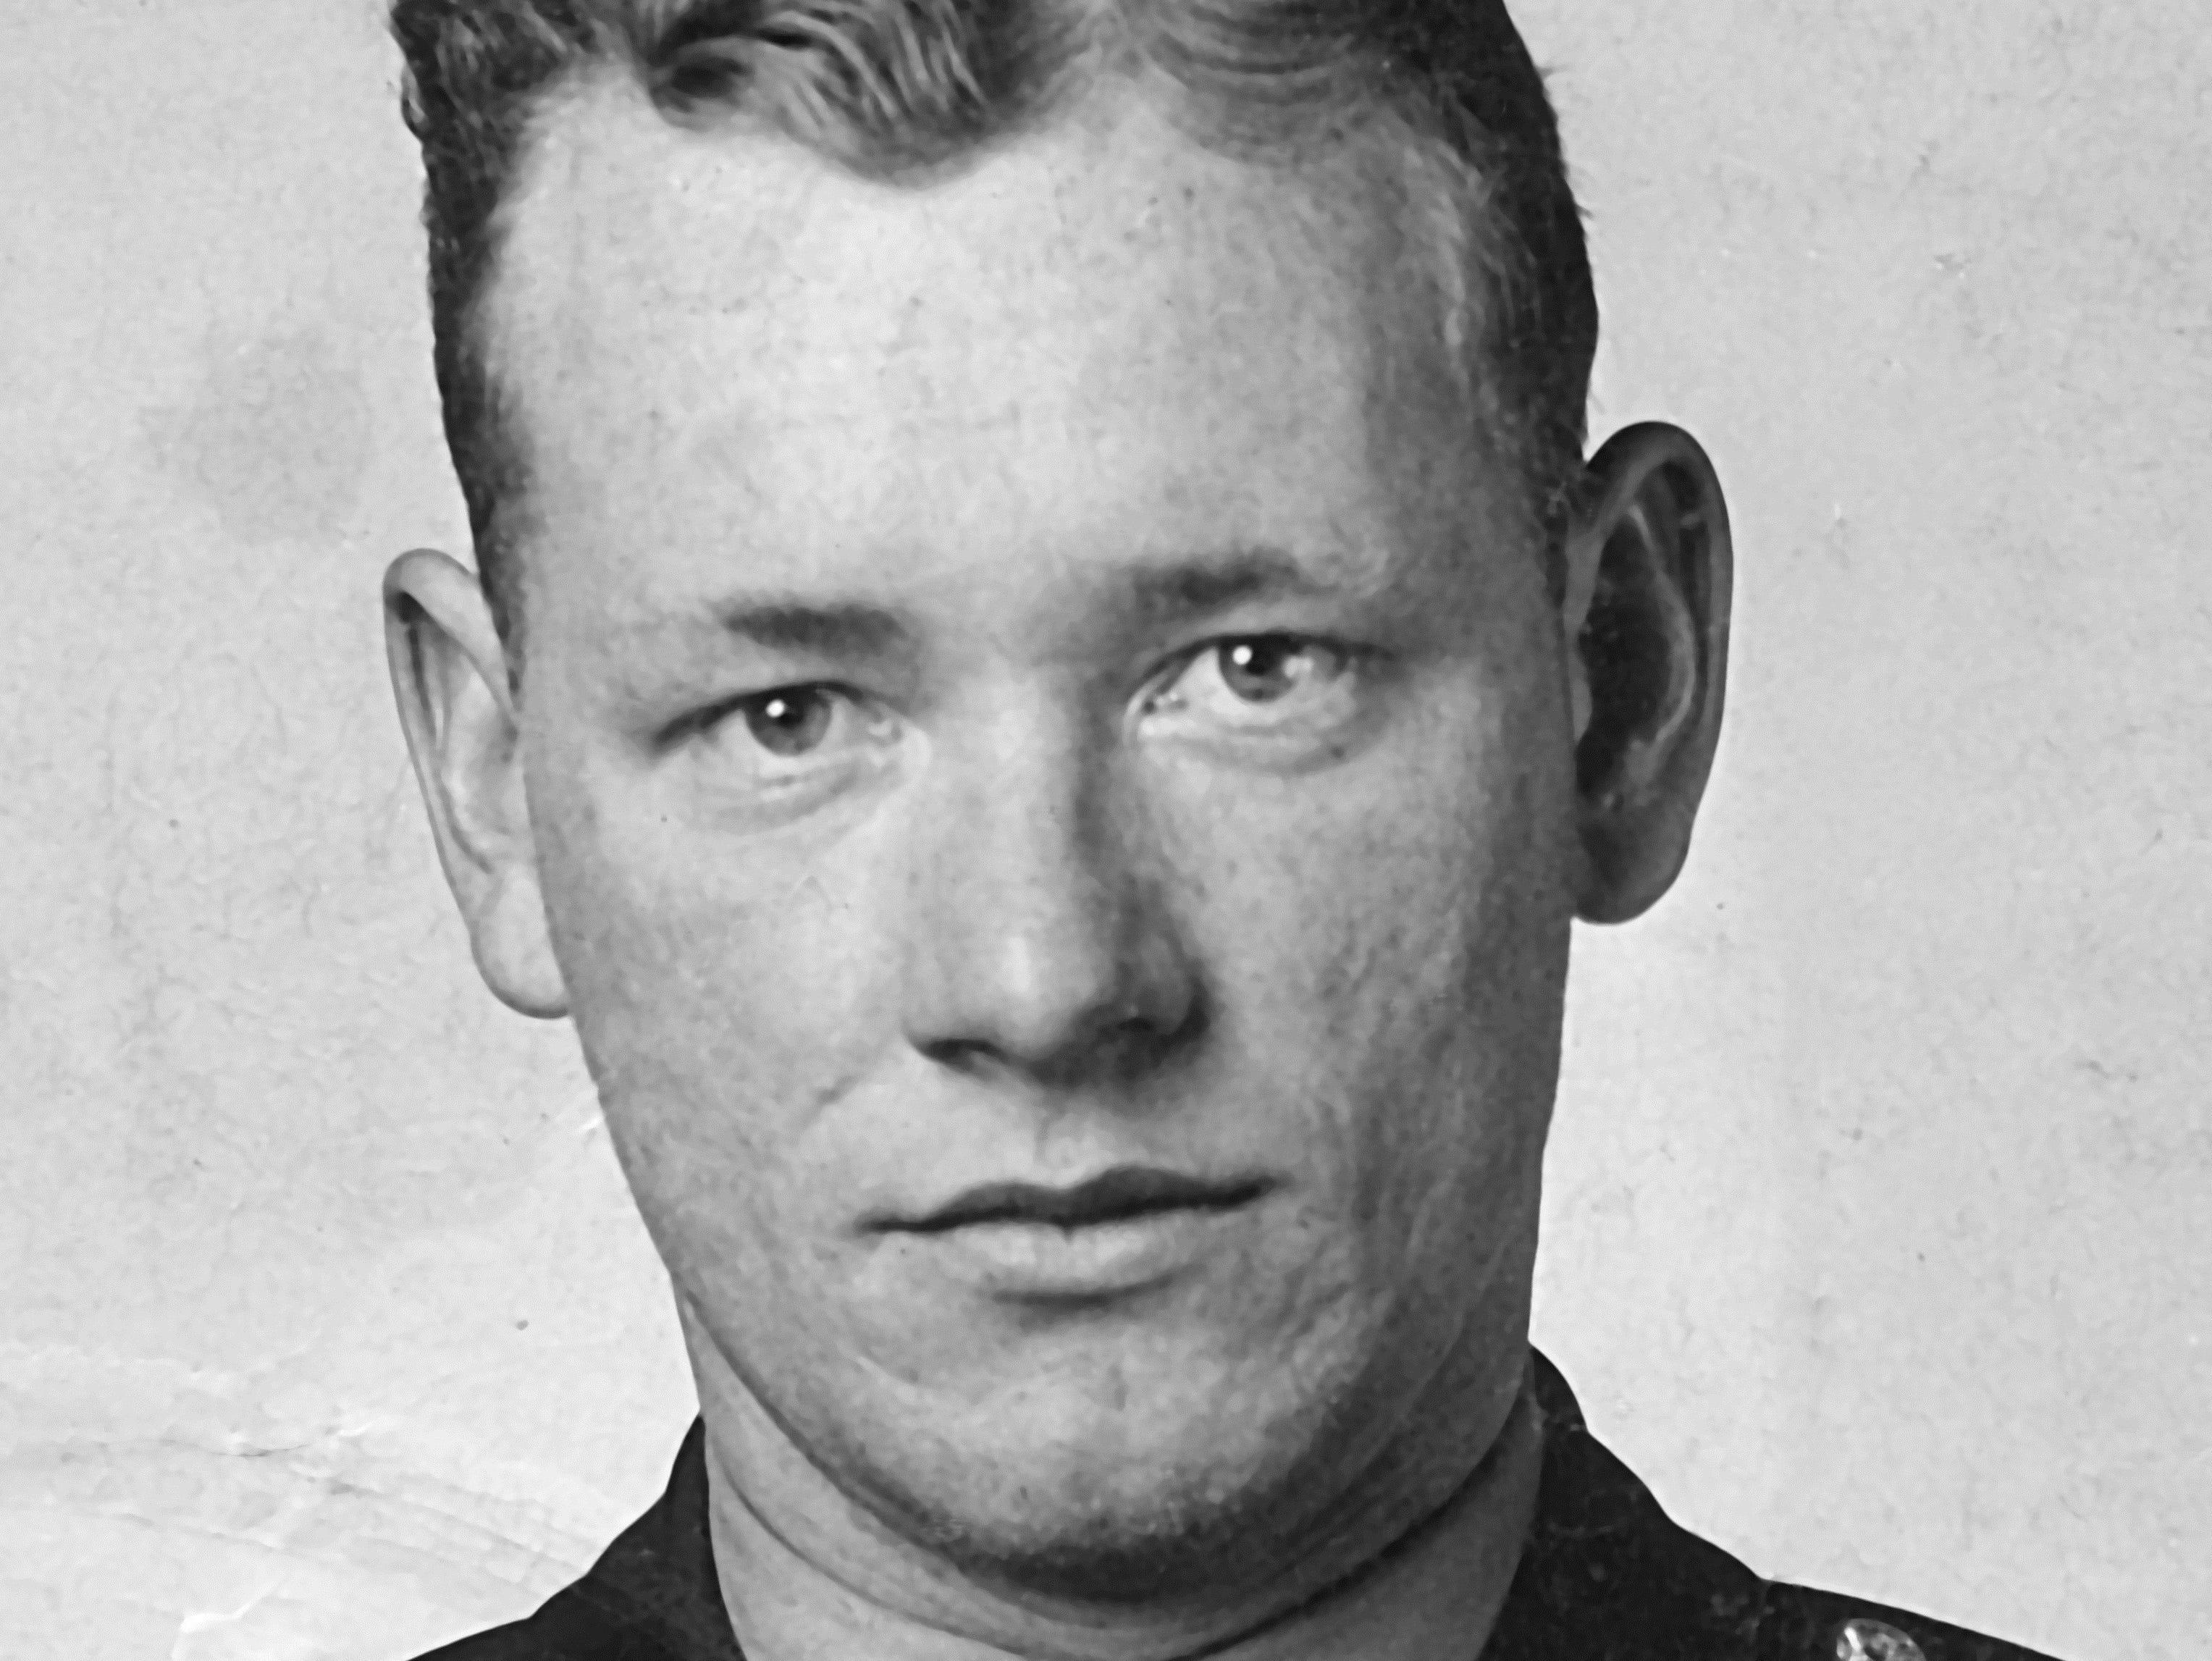 Lt. Armand Sedgeley